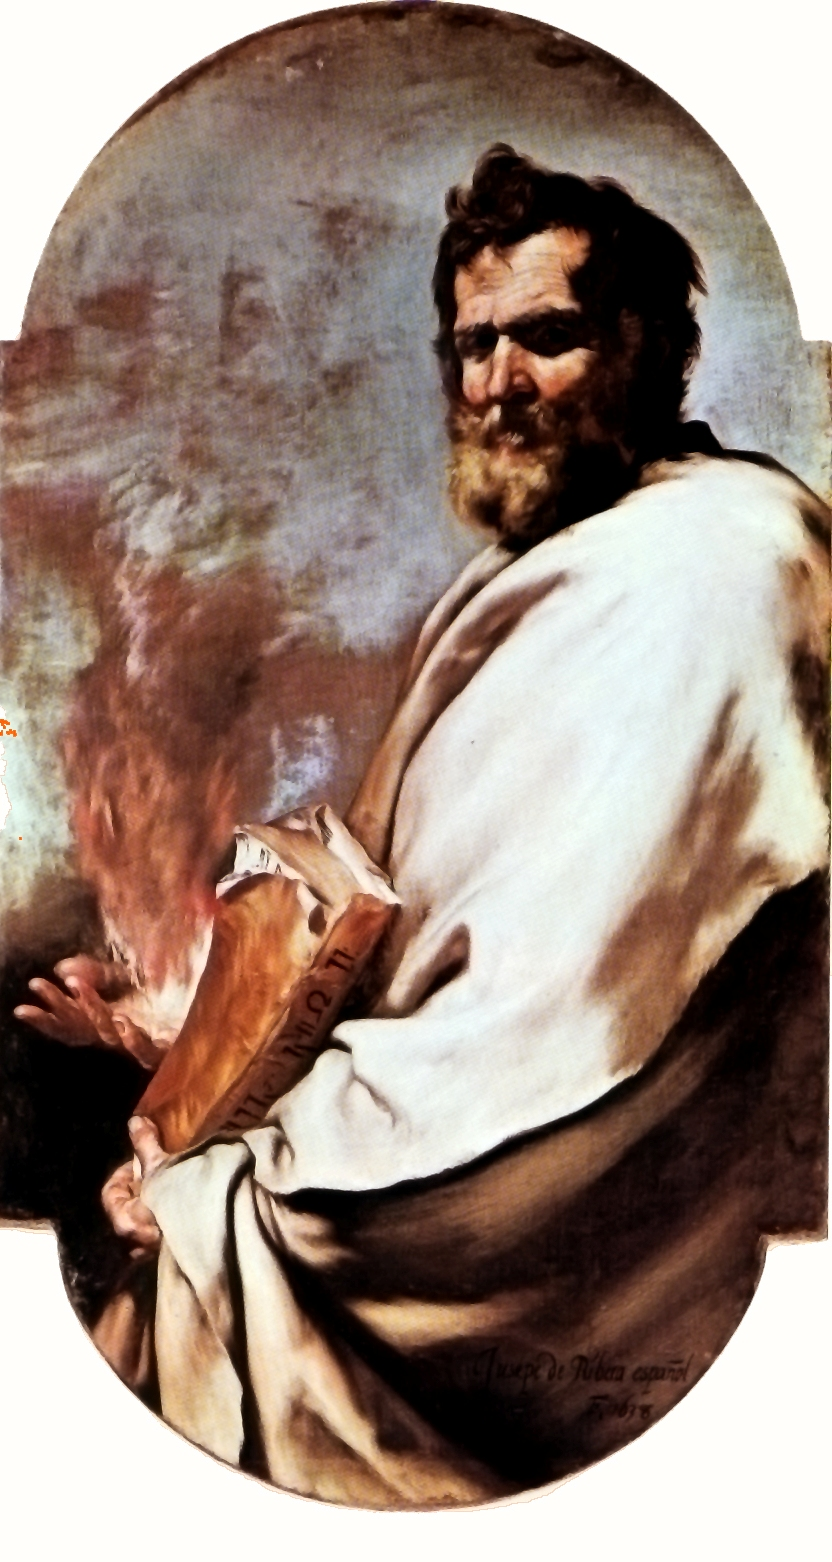 Пророк Элияху. Хосе де Рибера, 1638